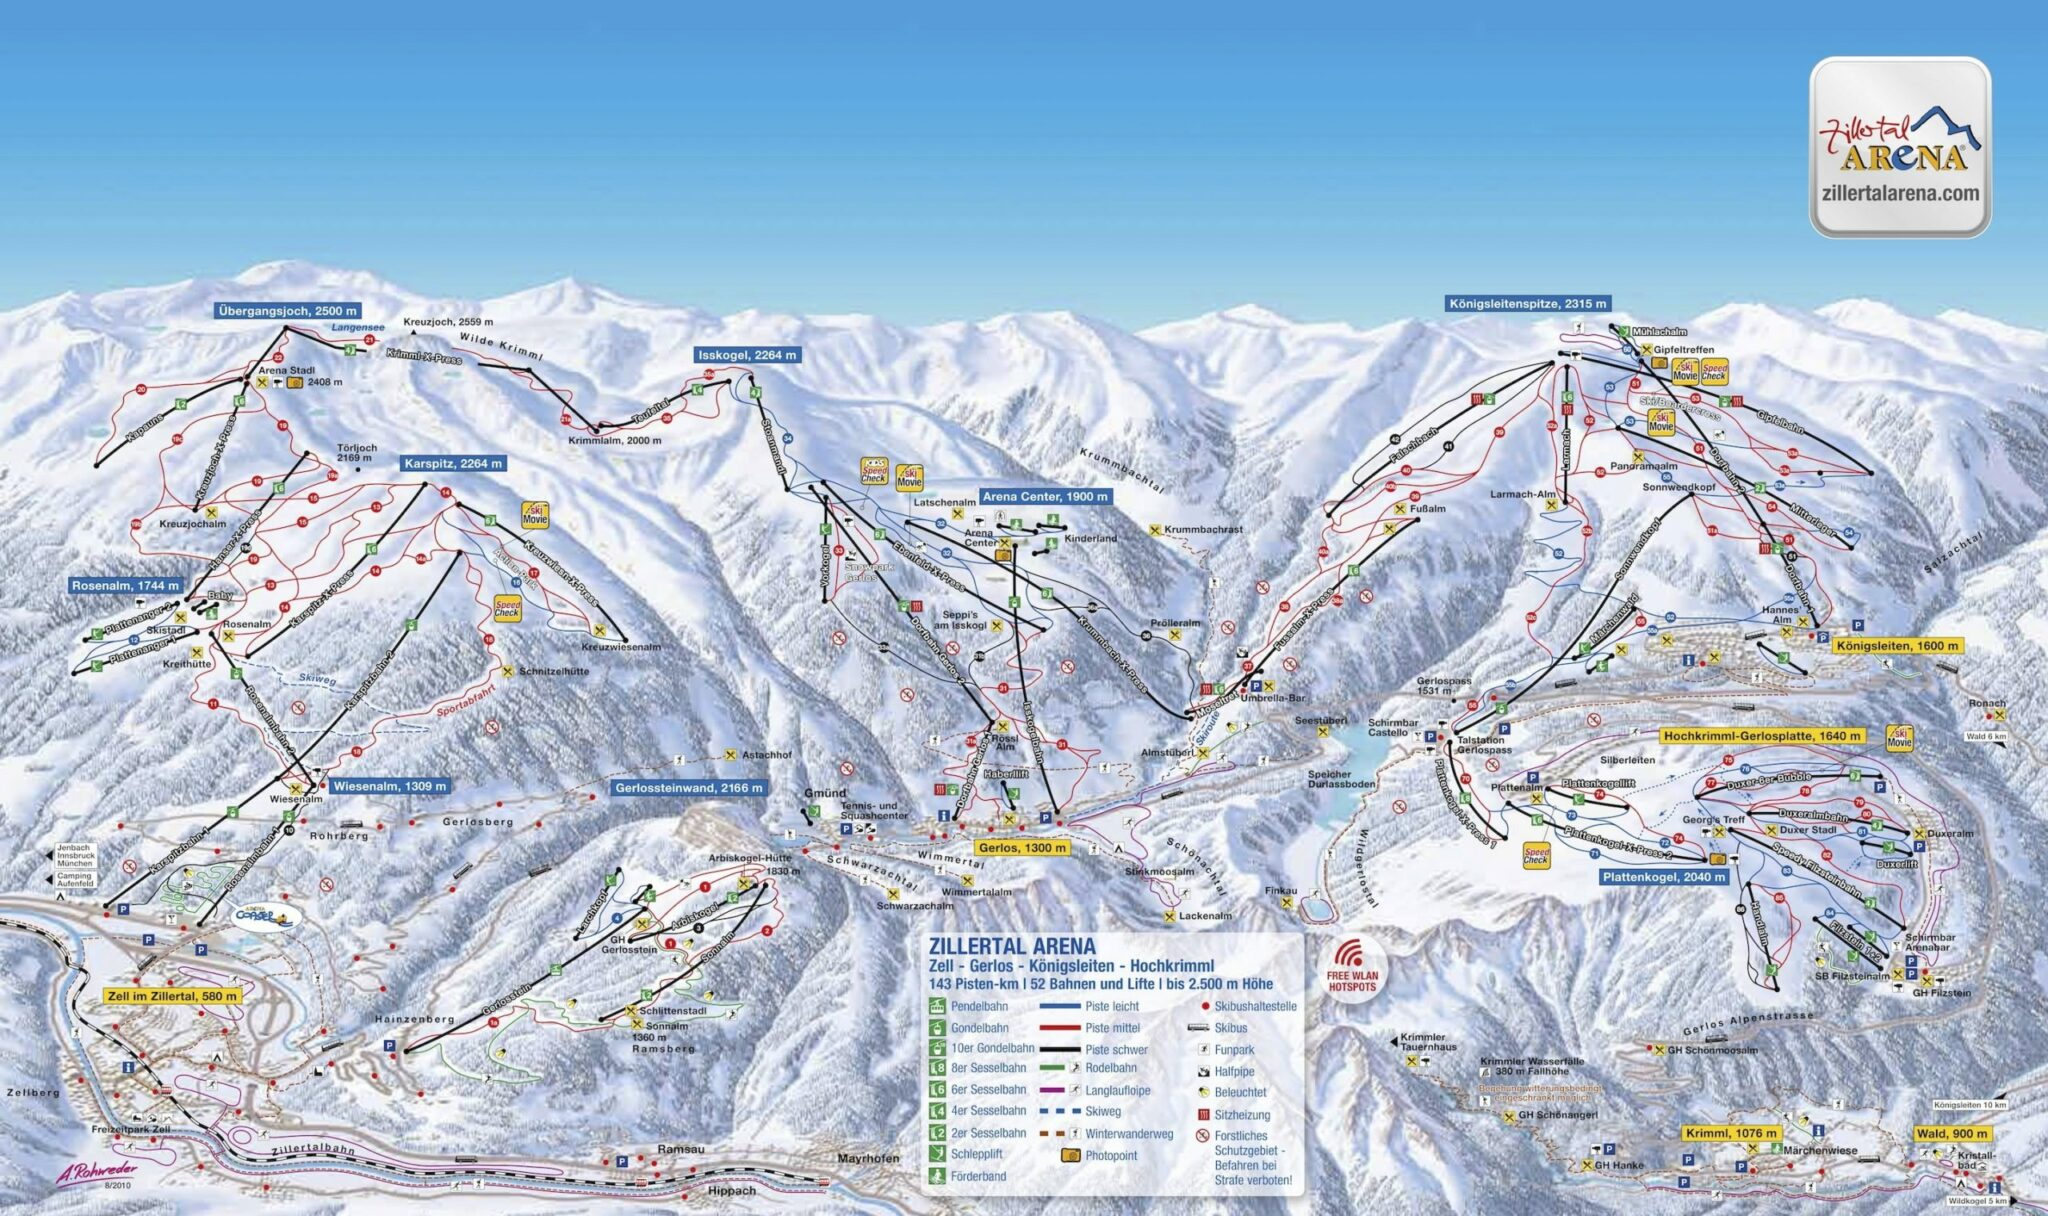 zillertal skigebied